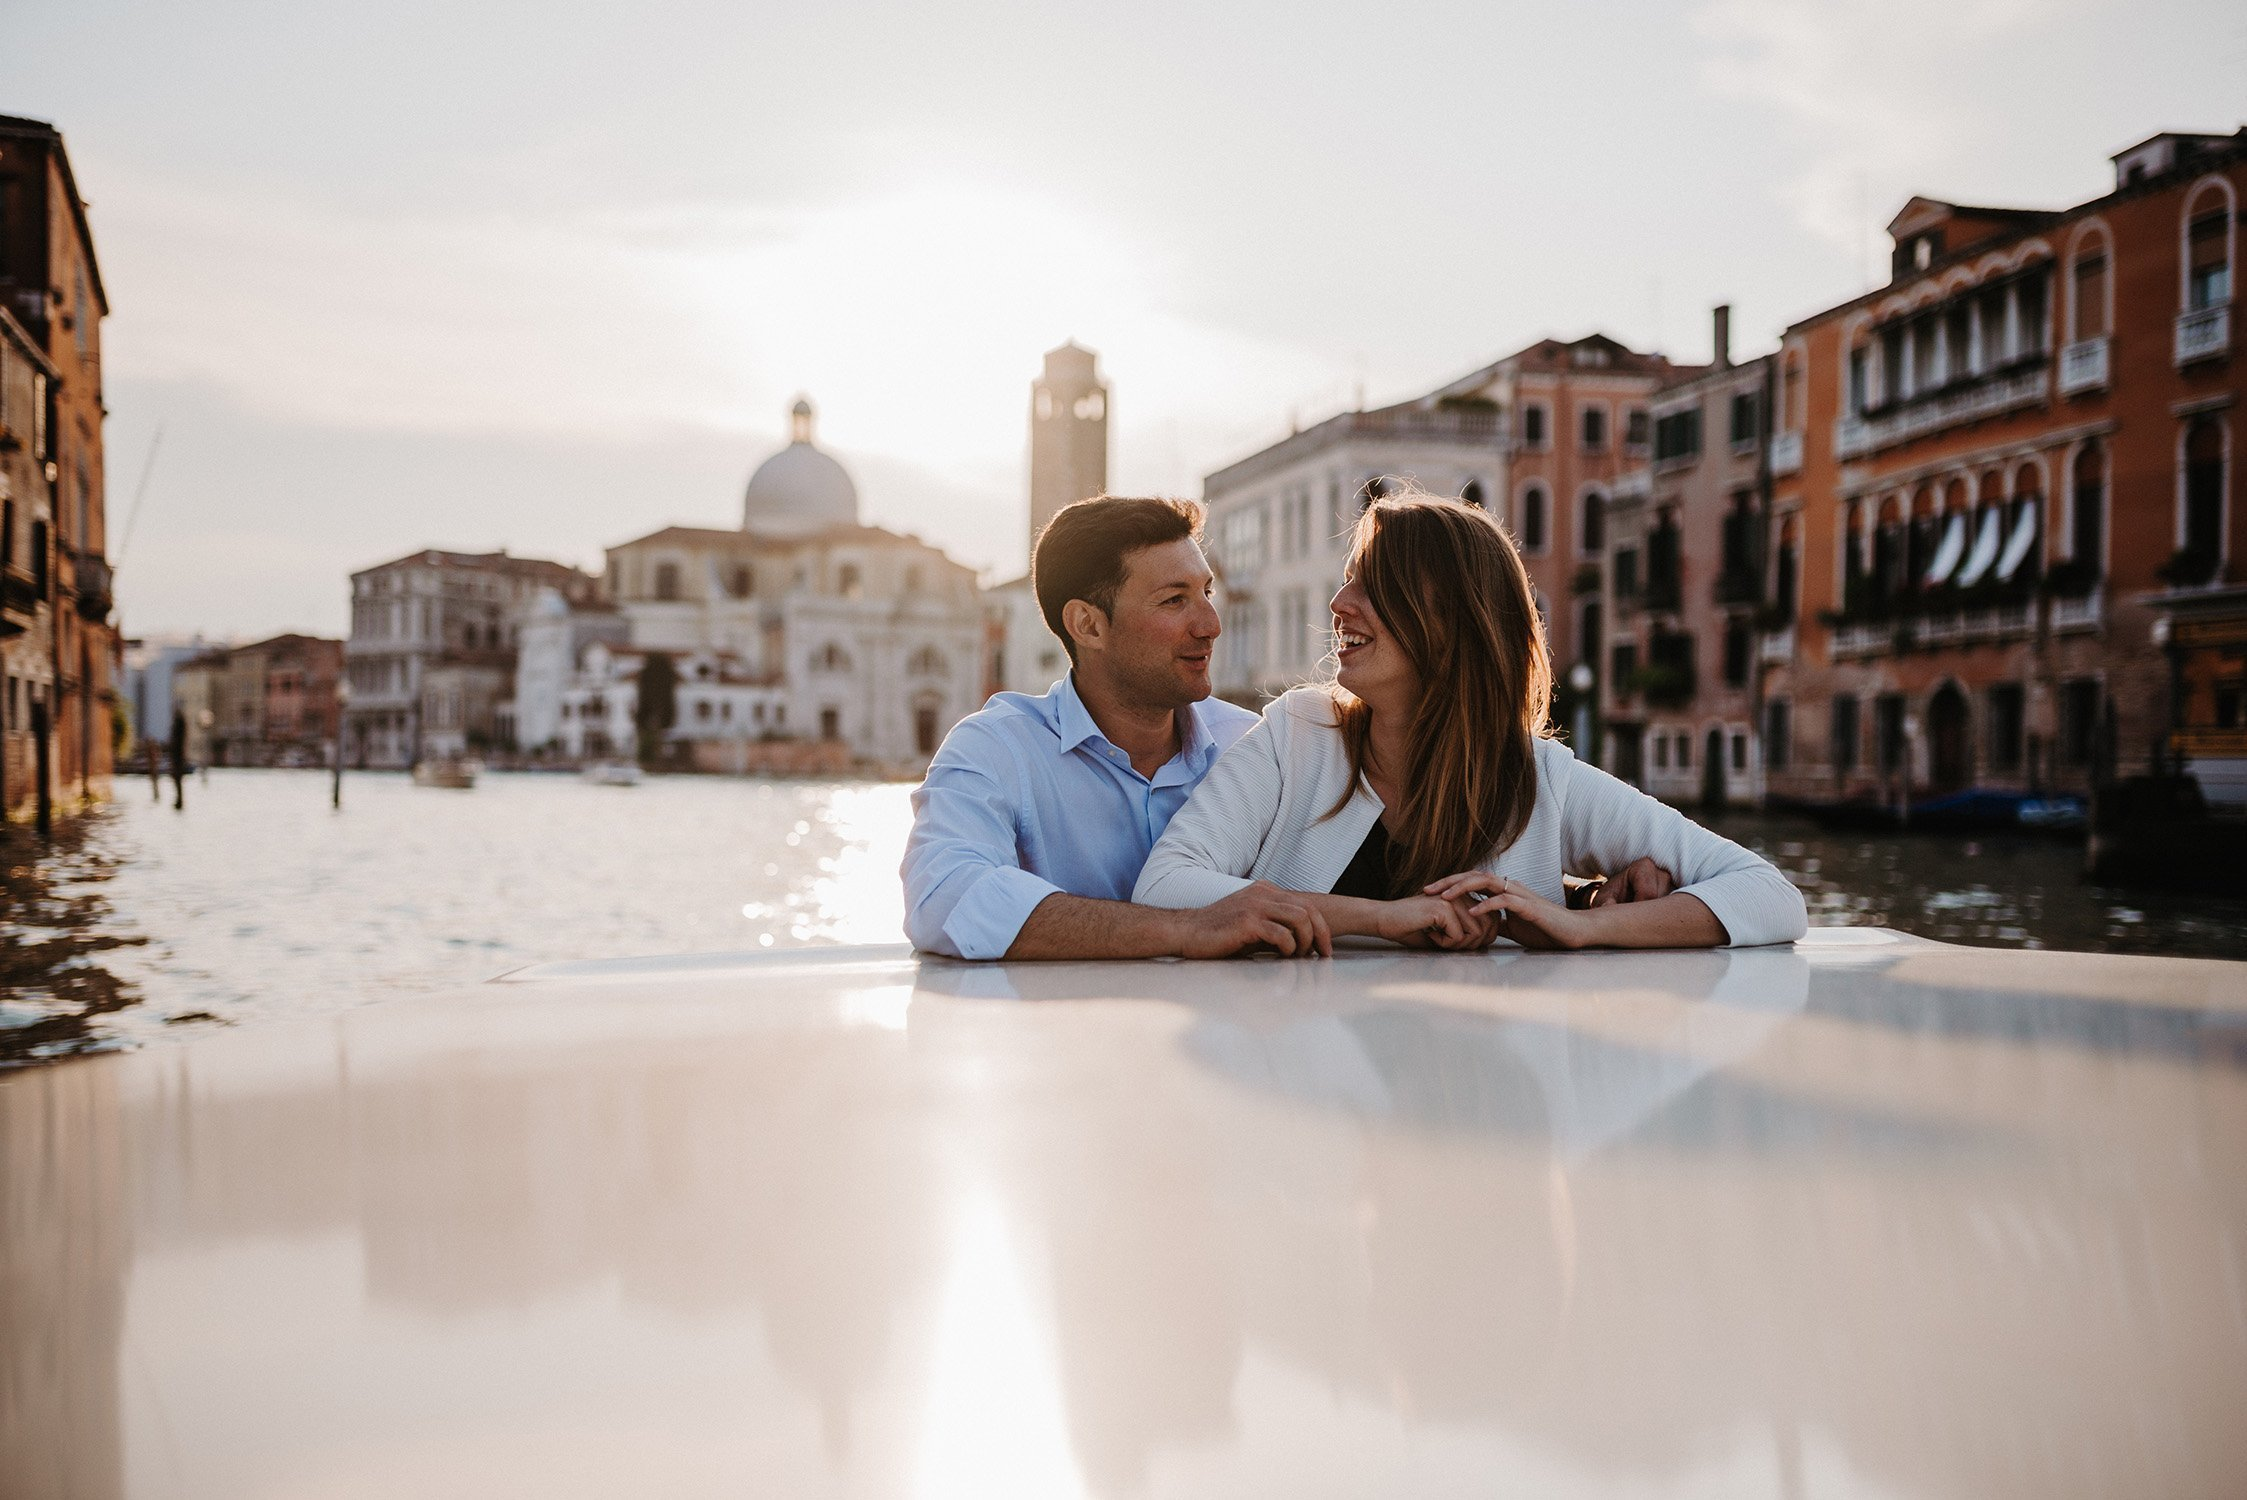 Engagement a Venezia. Servizio Prematrimoniale a Venezia. Luisa Basso Wedding Photographer. Italian Wedding photographer